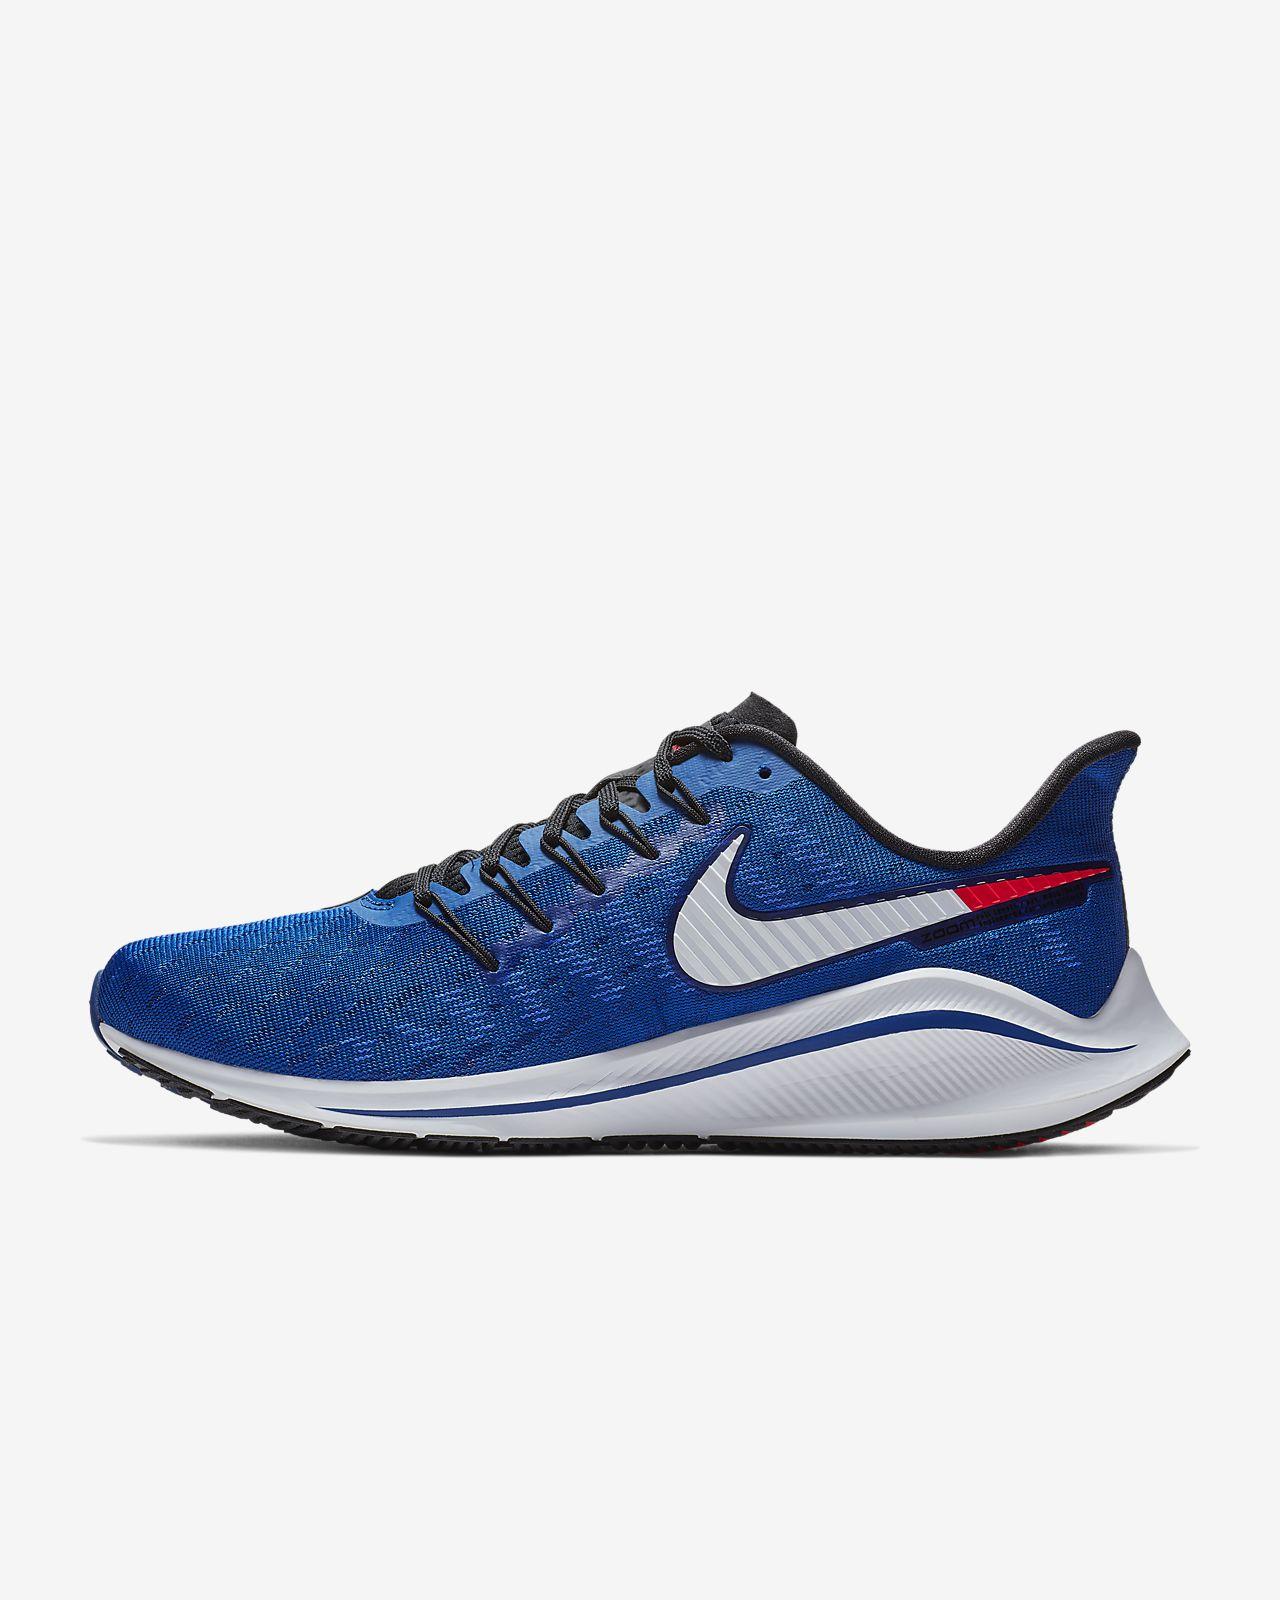 big sale d0054 a7ee1 Nike Air Zoom Vomero 14-løbesko til mænd